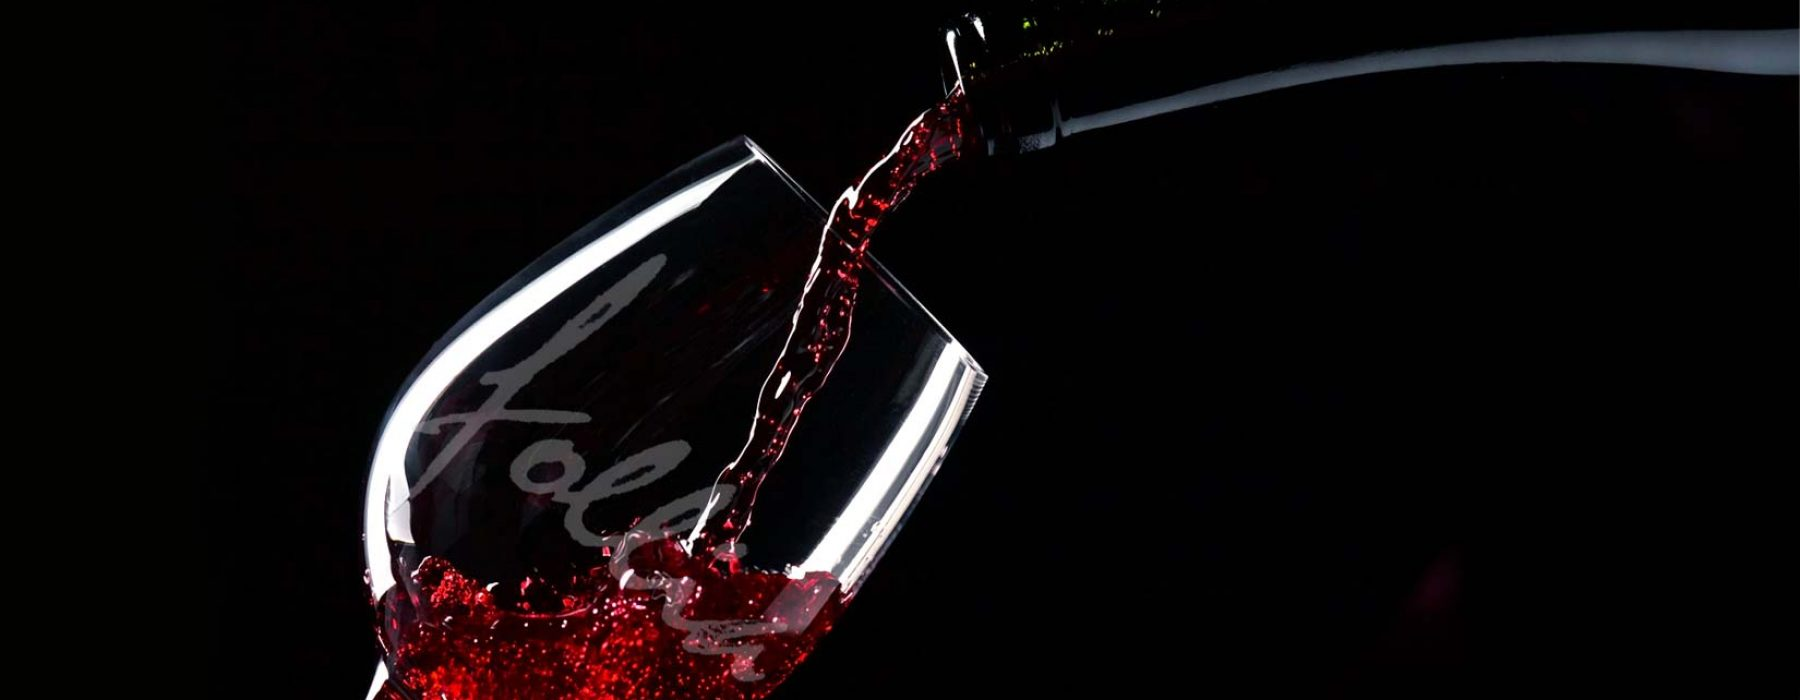 Piana dei Castelli: Wine out of Love